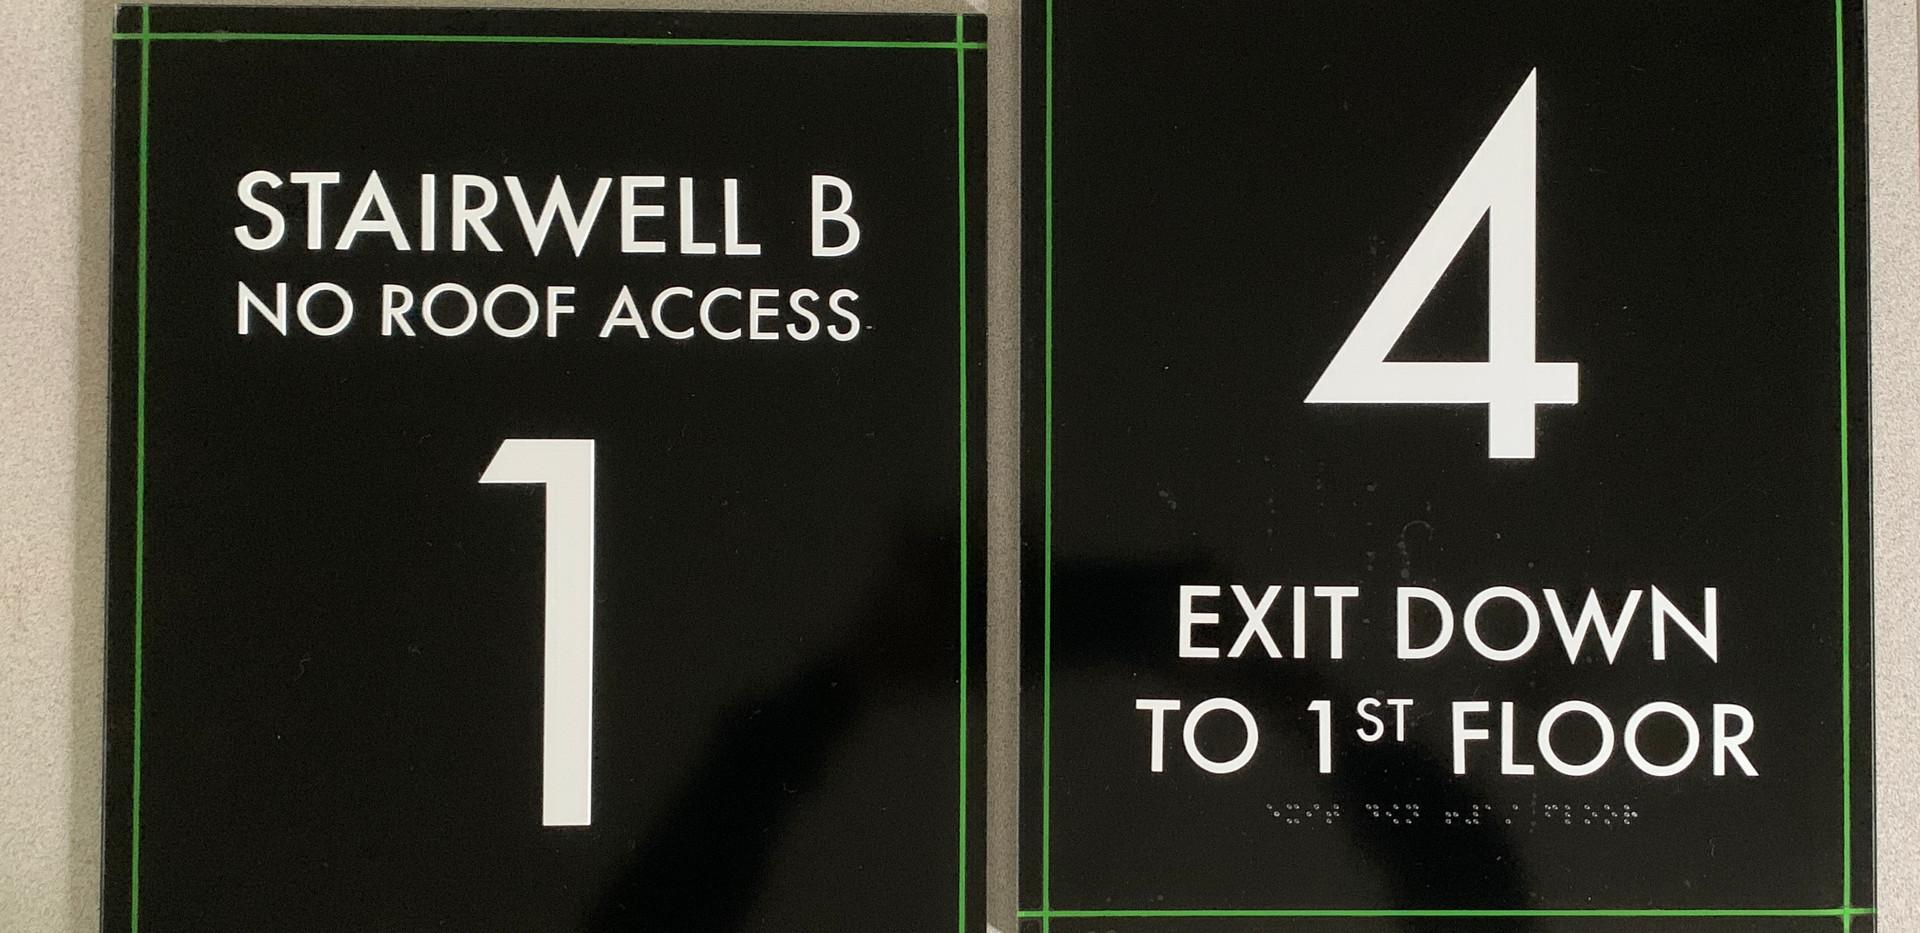 ADA Wayfinding Signs